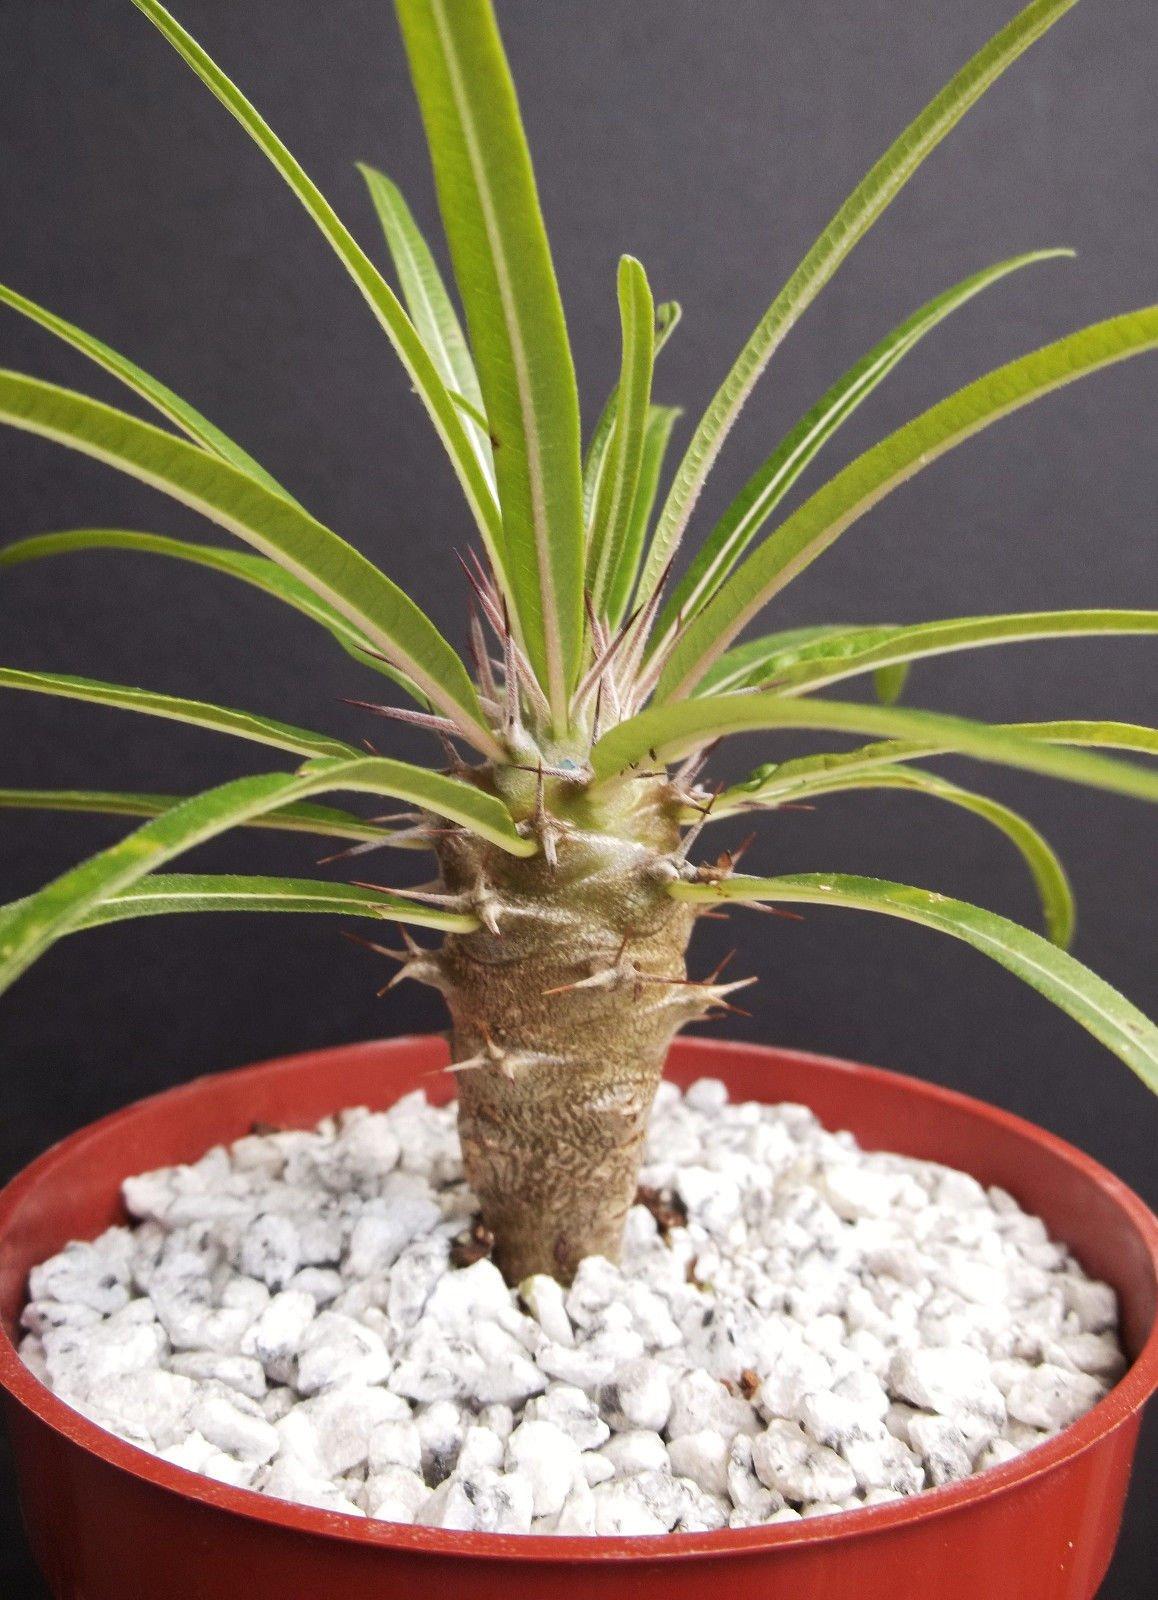 Madagascar Palm Plant Cactus cacti 3 to 4 inches